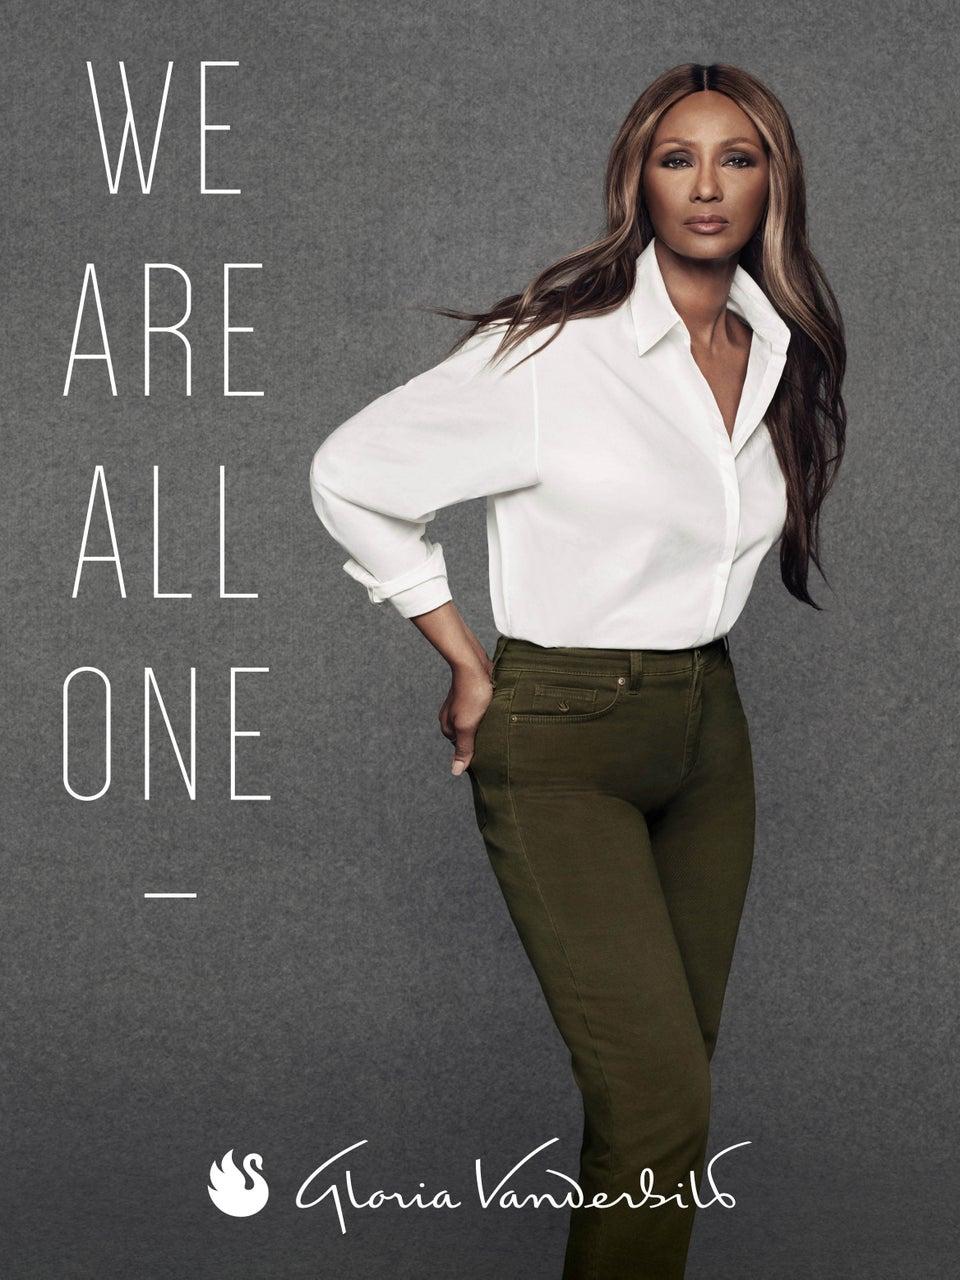 Iman Stars in Gloria Vanderbilt's 'We Are One' Campaign Celebrating Womanhood